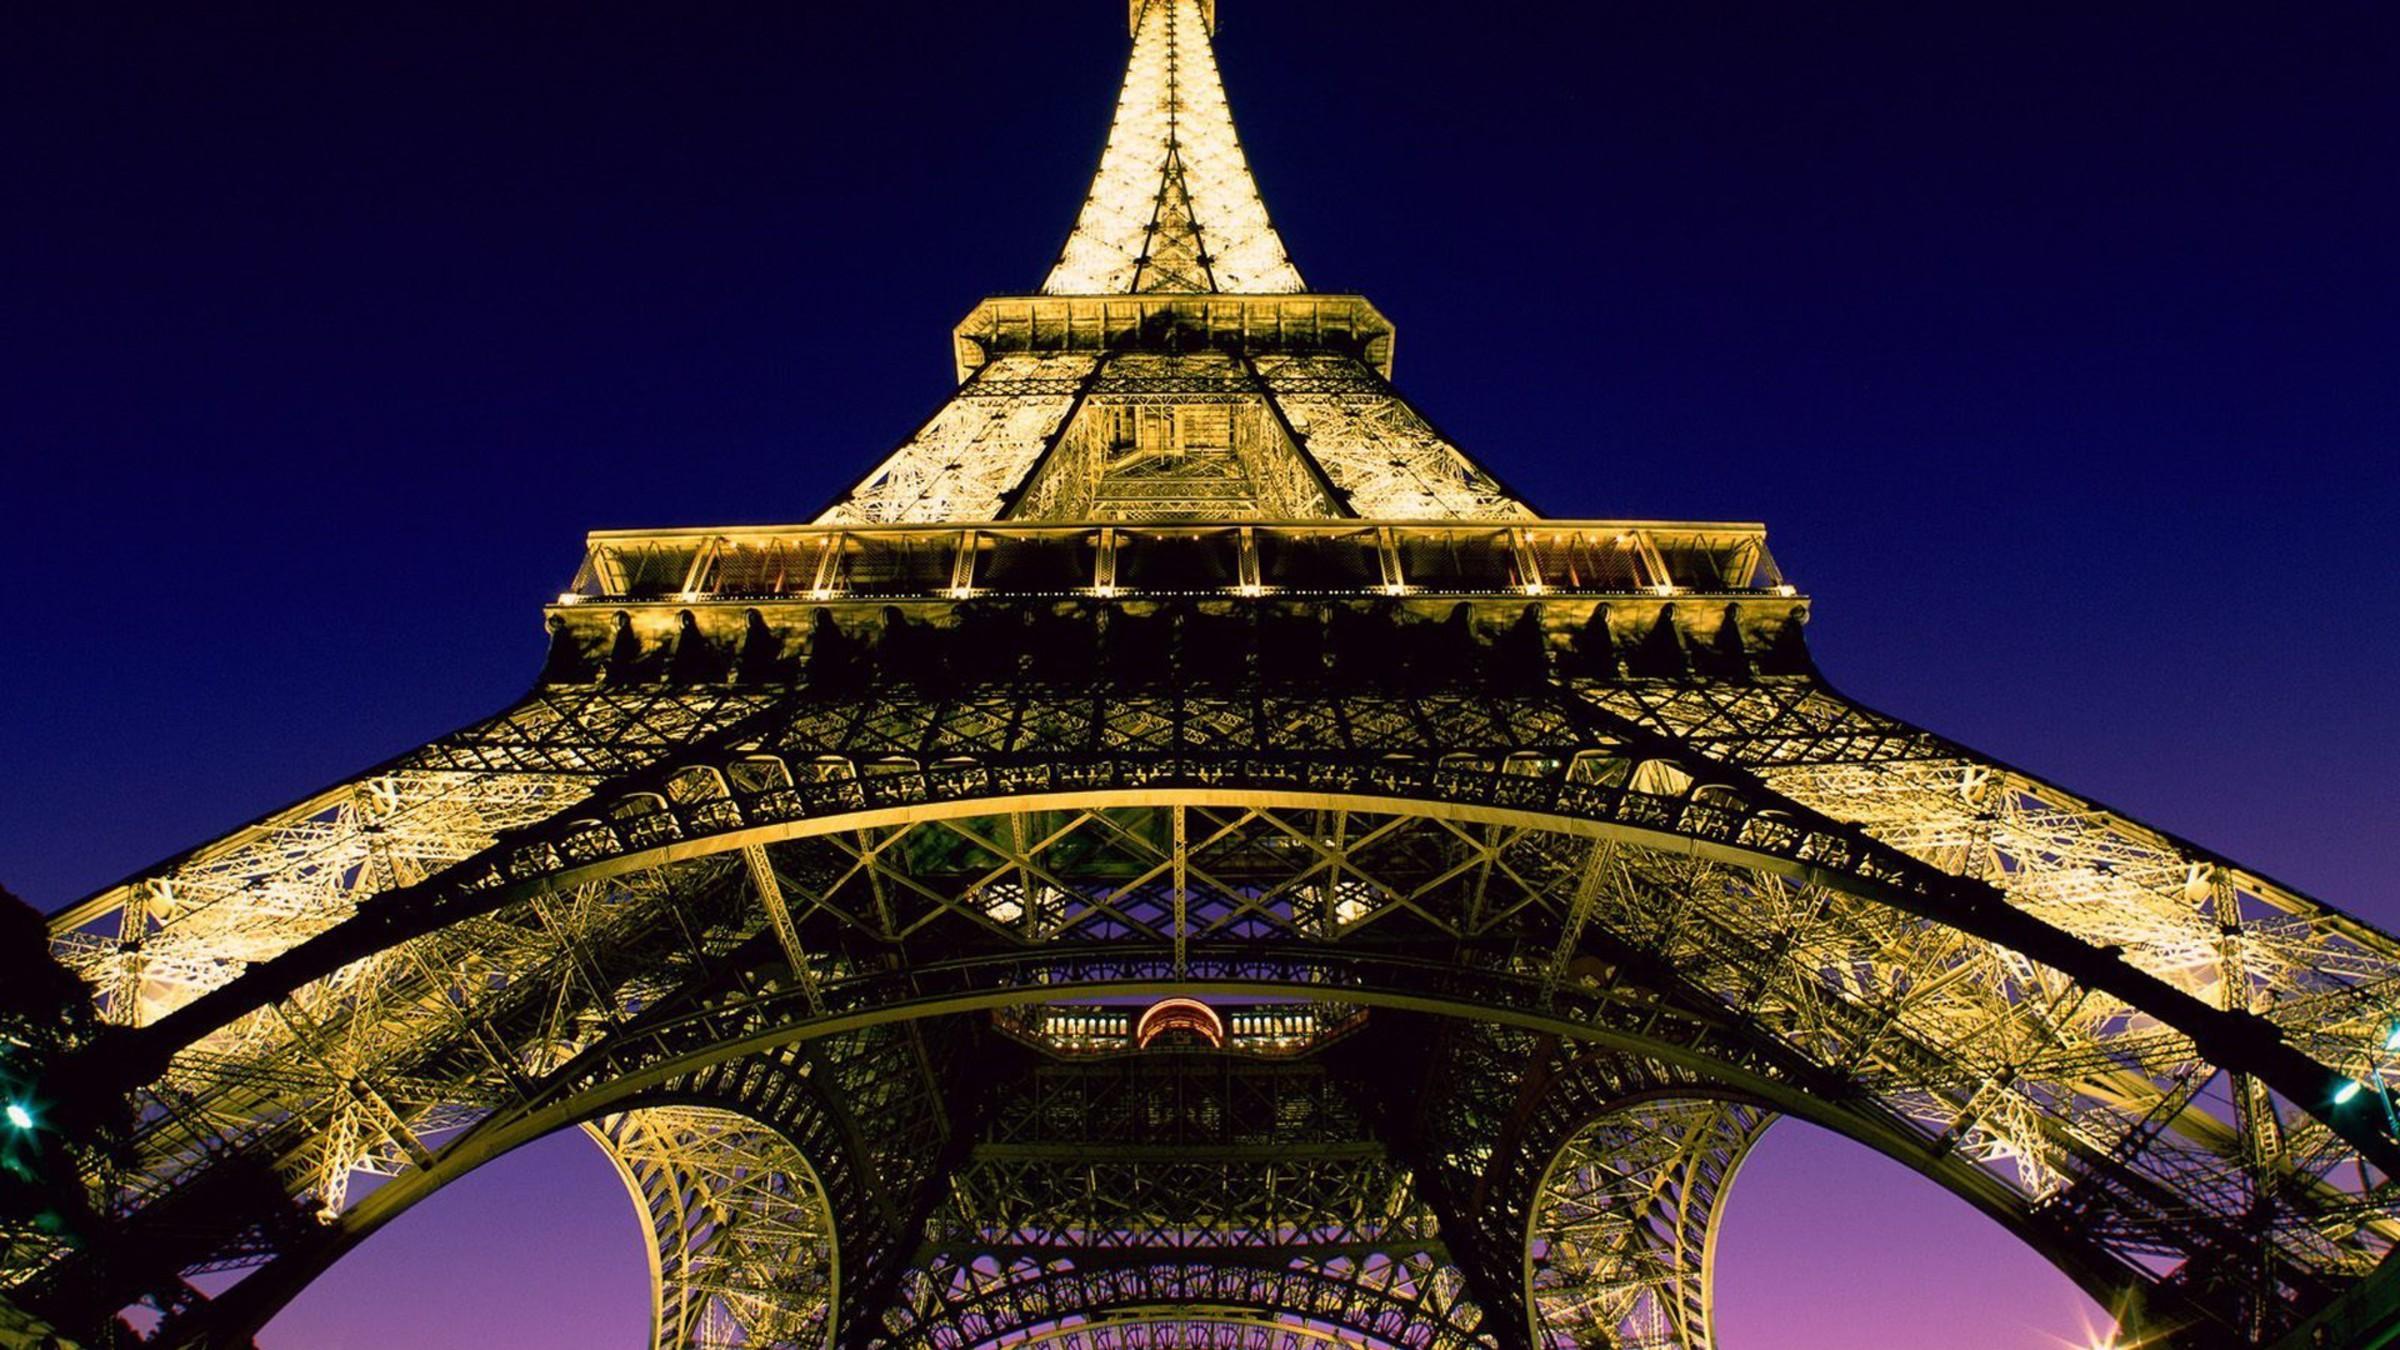 بالصور صور لبرج ايفل , اجمل صور لبرح ايفل بفرنسا 3314 21